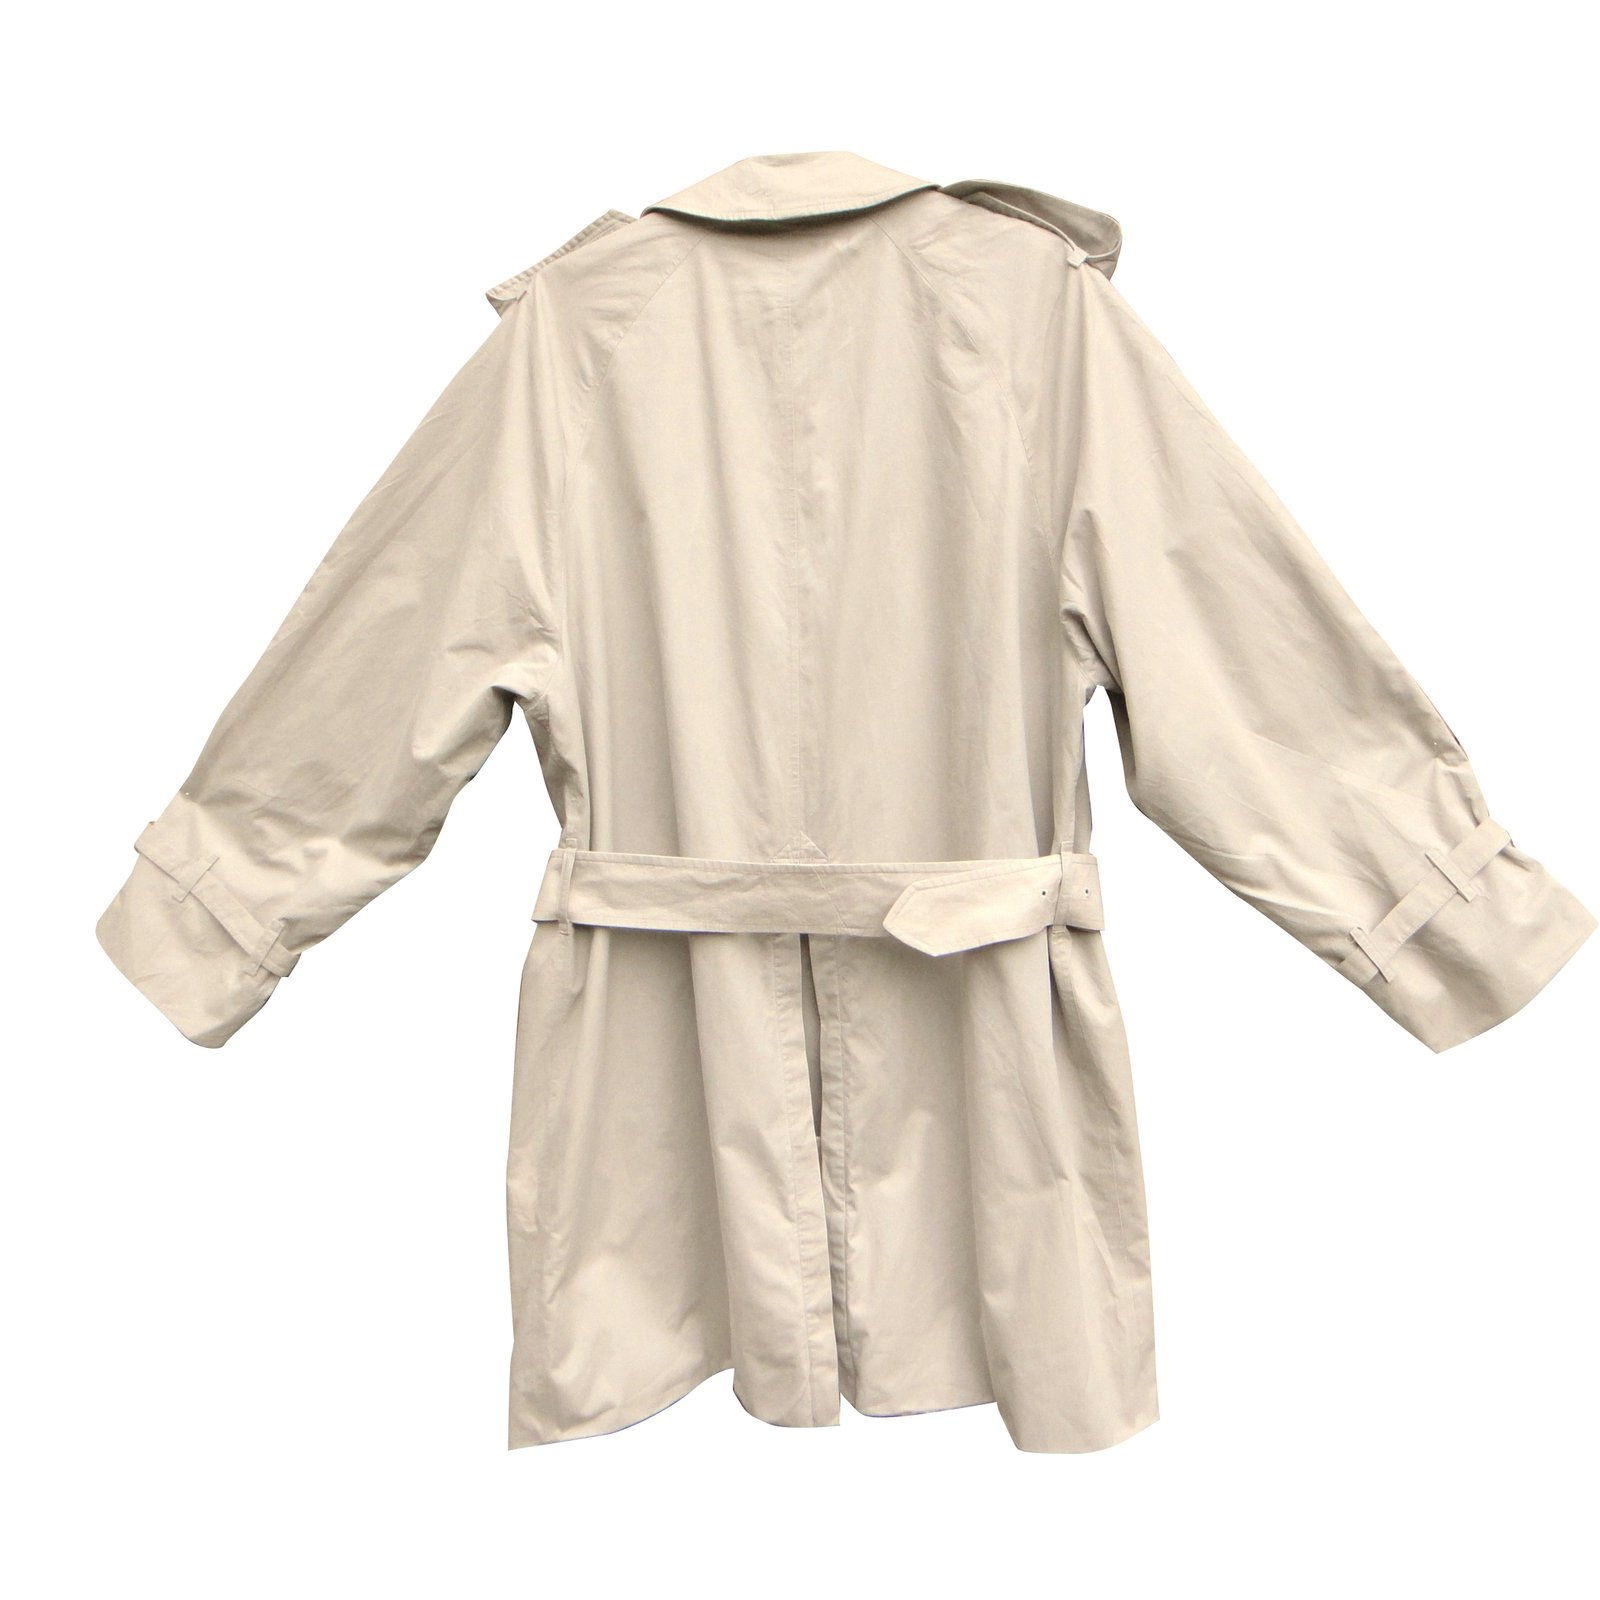 manteaux homme burberry trench coat coton beige. Black Bedroom Furniture Sets. Home Design Ideas